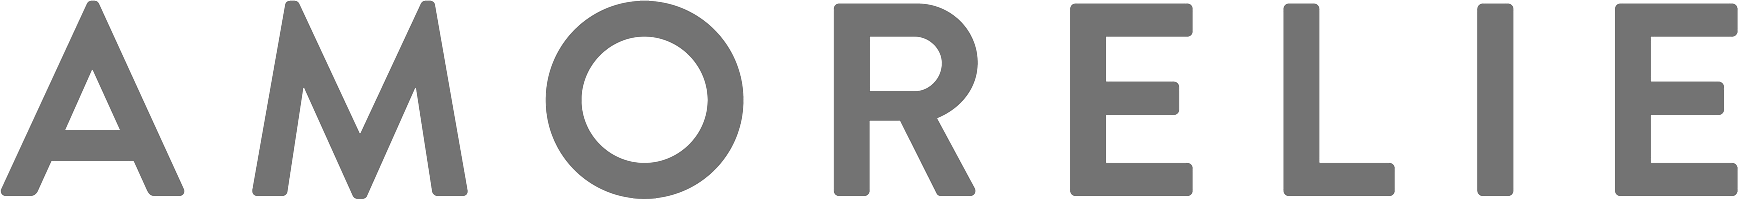 Amorelie logo grey 6b705c